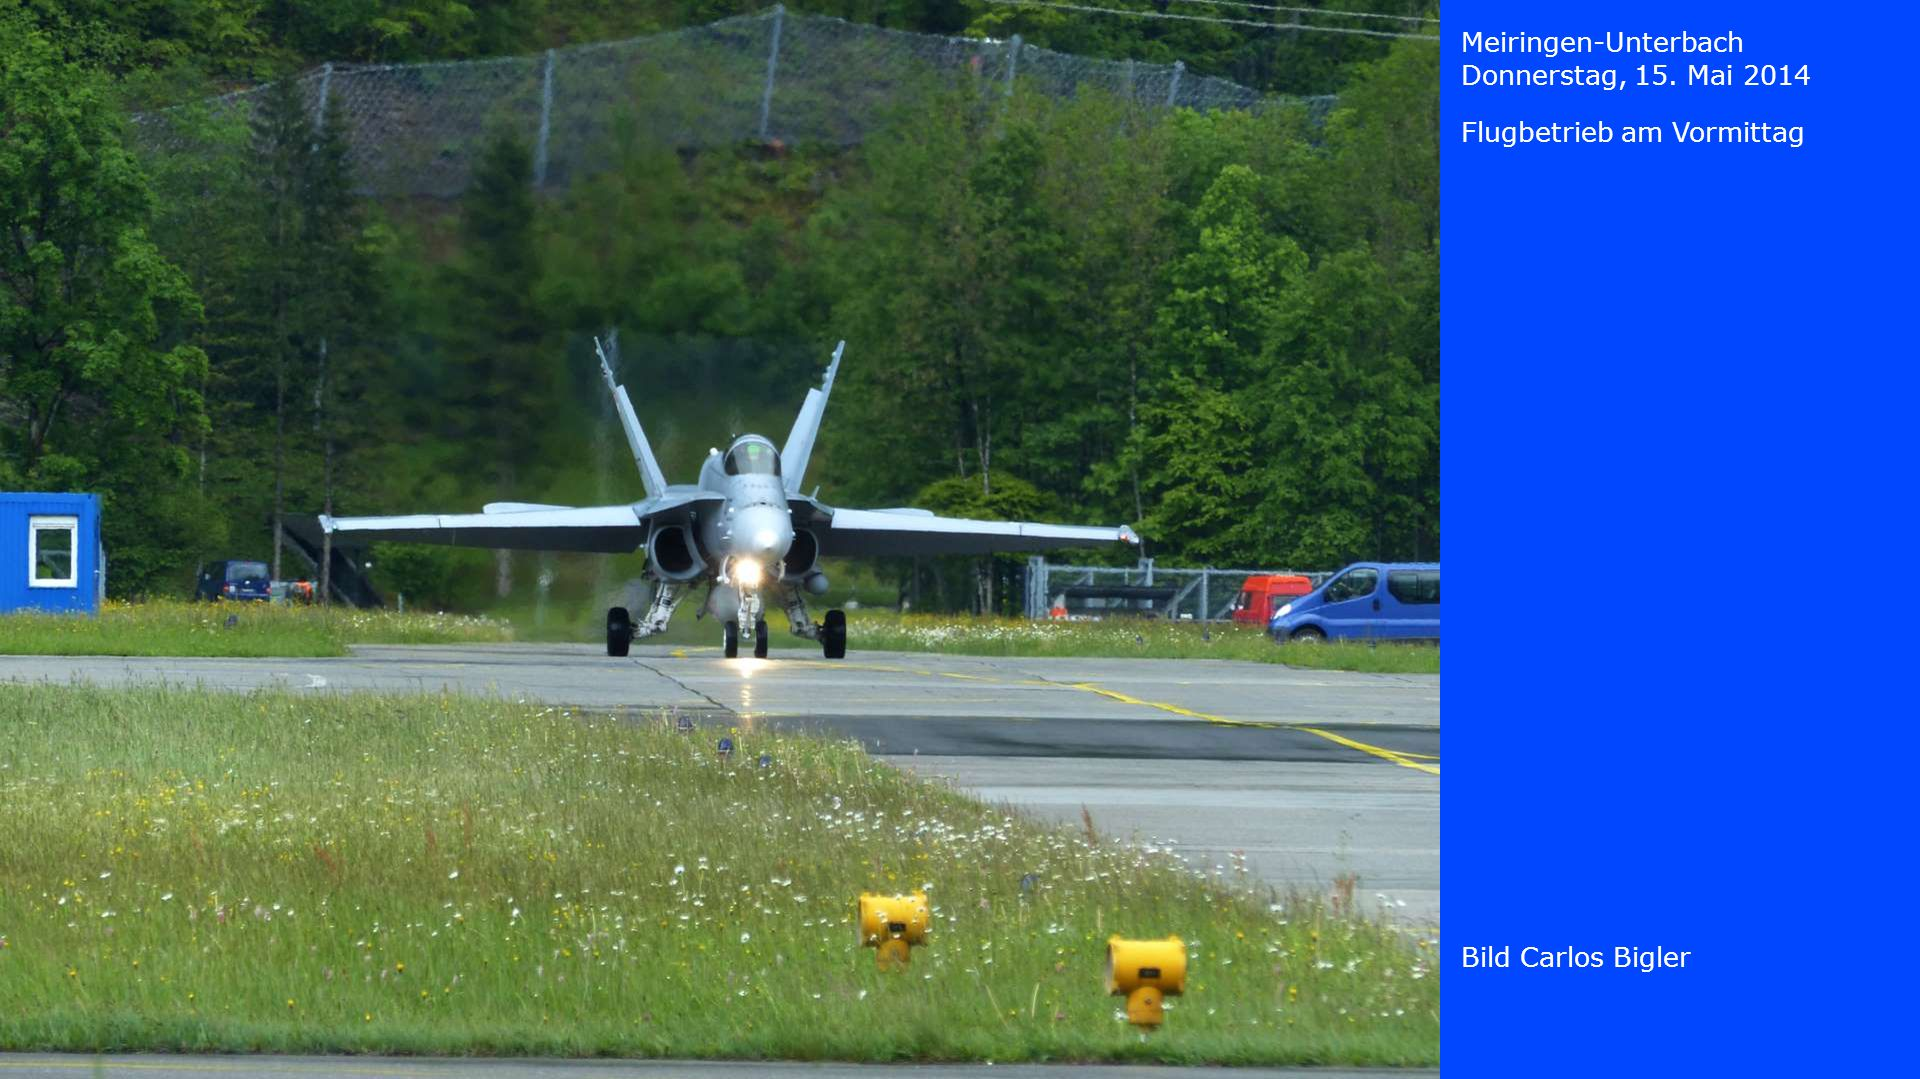 Meiringen-Unterbach Donnerstag, 15. Mai 2014 Flugbetrieb am Vormittag Bild Carlos Bigler